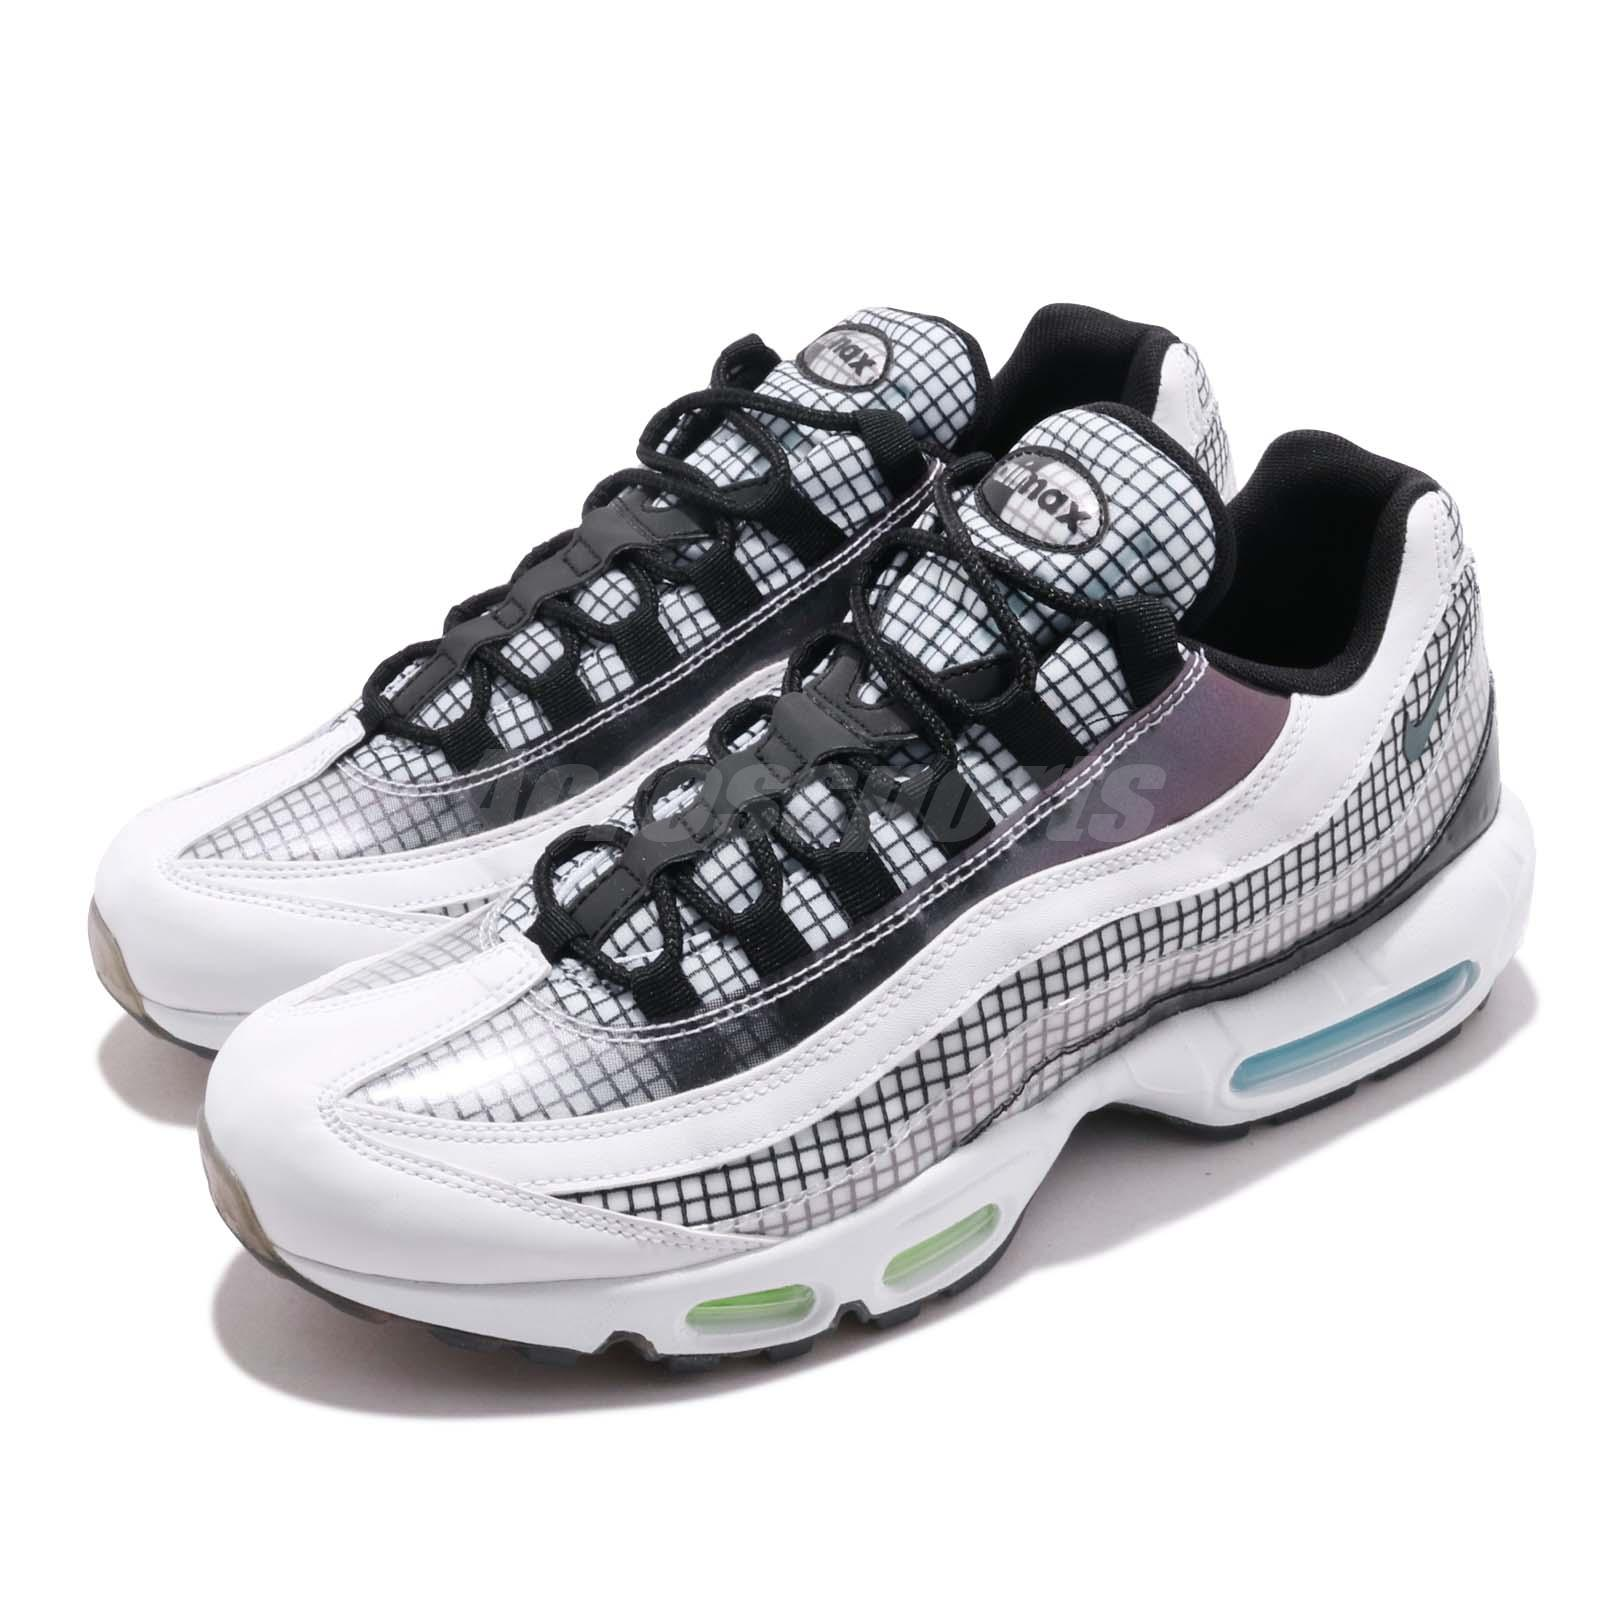 Details about Nike Air Max 95 LV8 Grid White Black Blue Gaze Men Running Shoes AO2450 100